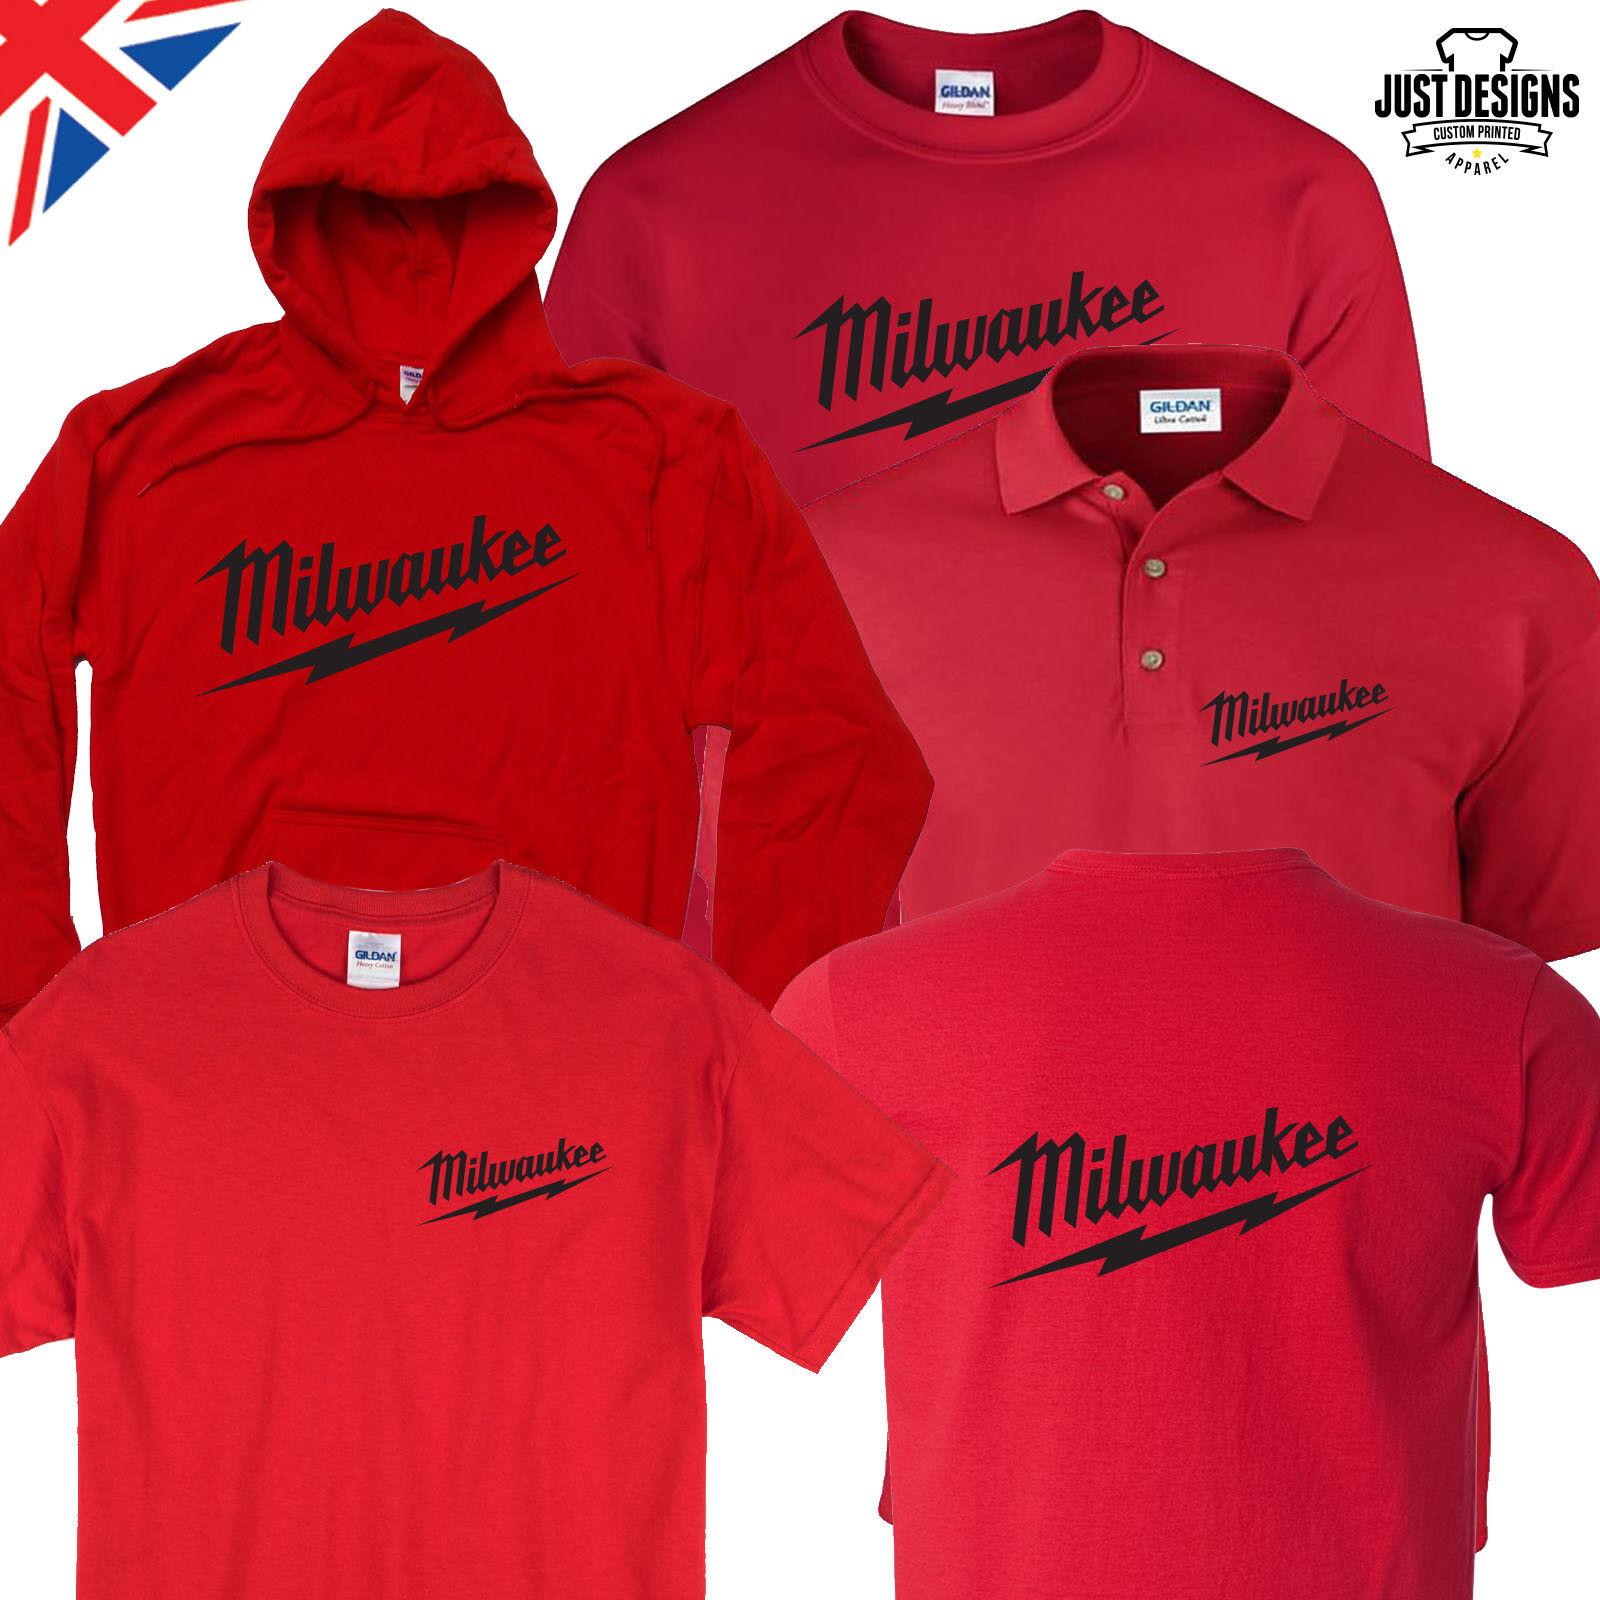 Milwaukee Red T-shirt Hoodie Polo Shirt Jumper S-5XL Power T